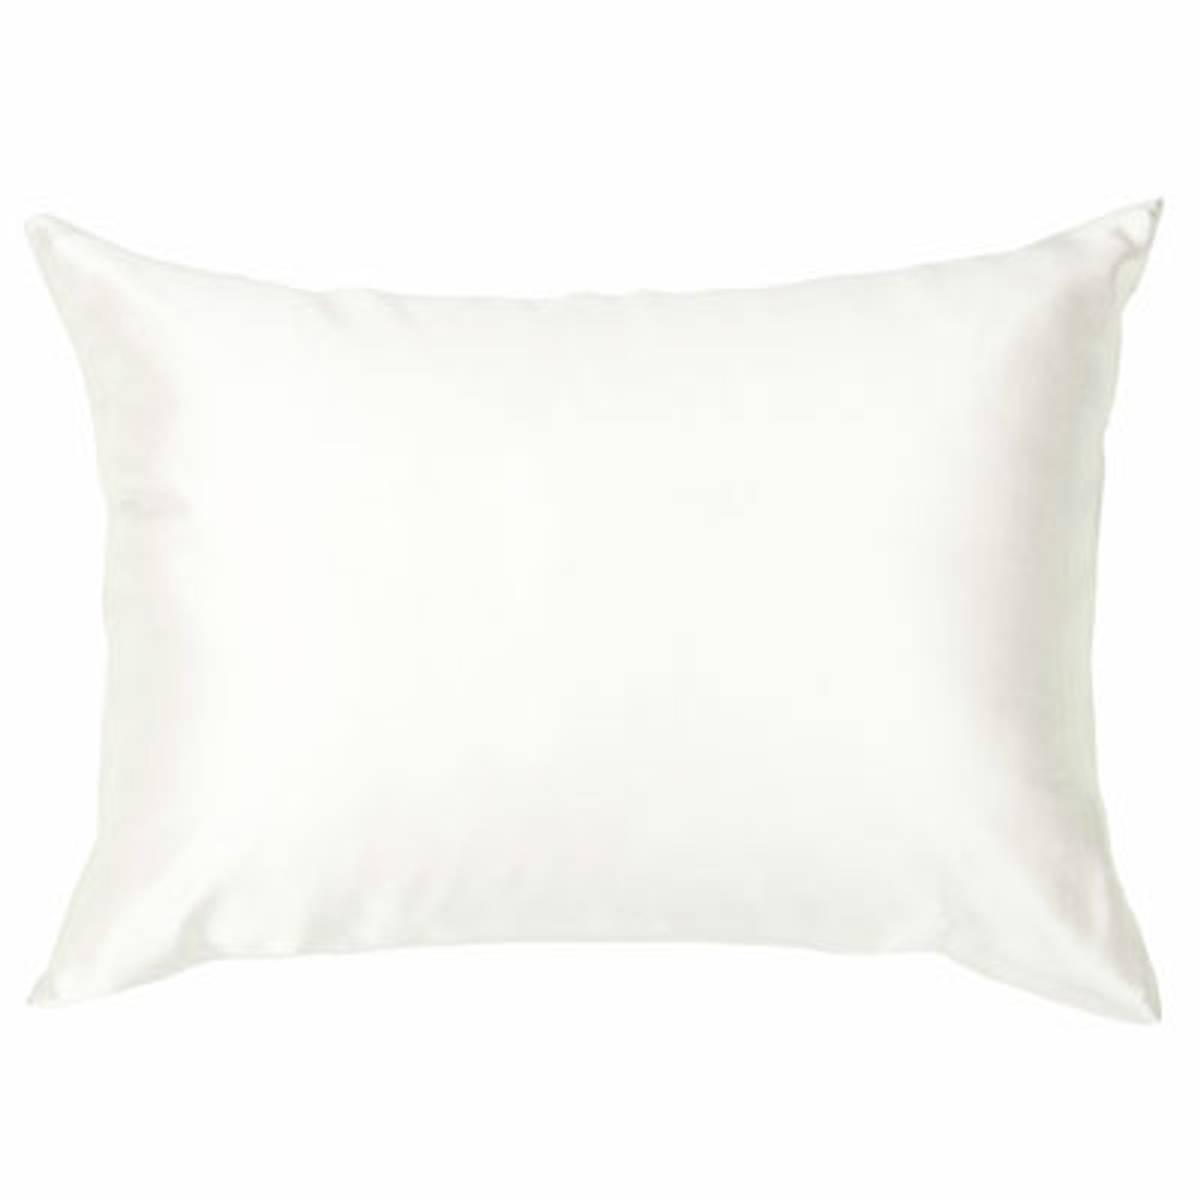 Silkeputetrekk - hvit - glidelås